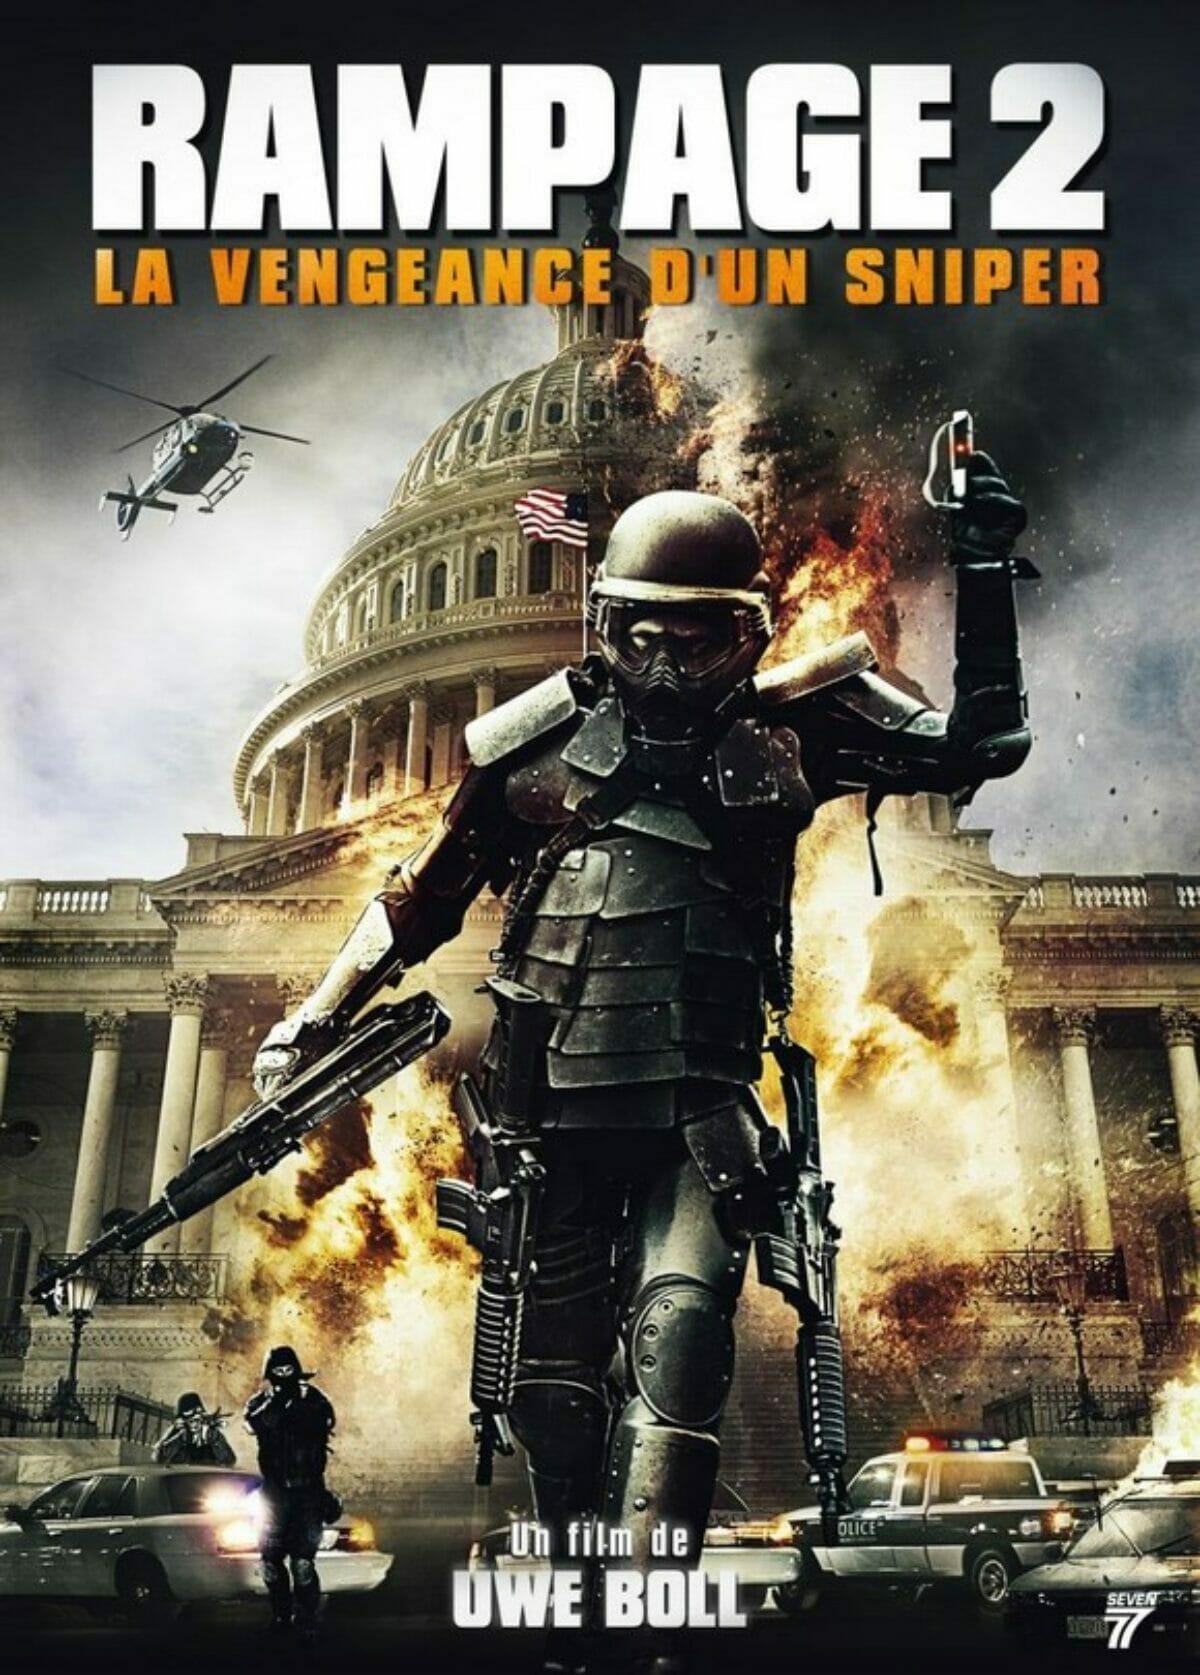 Rampage2-poster